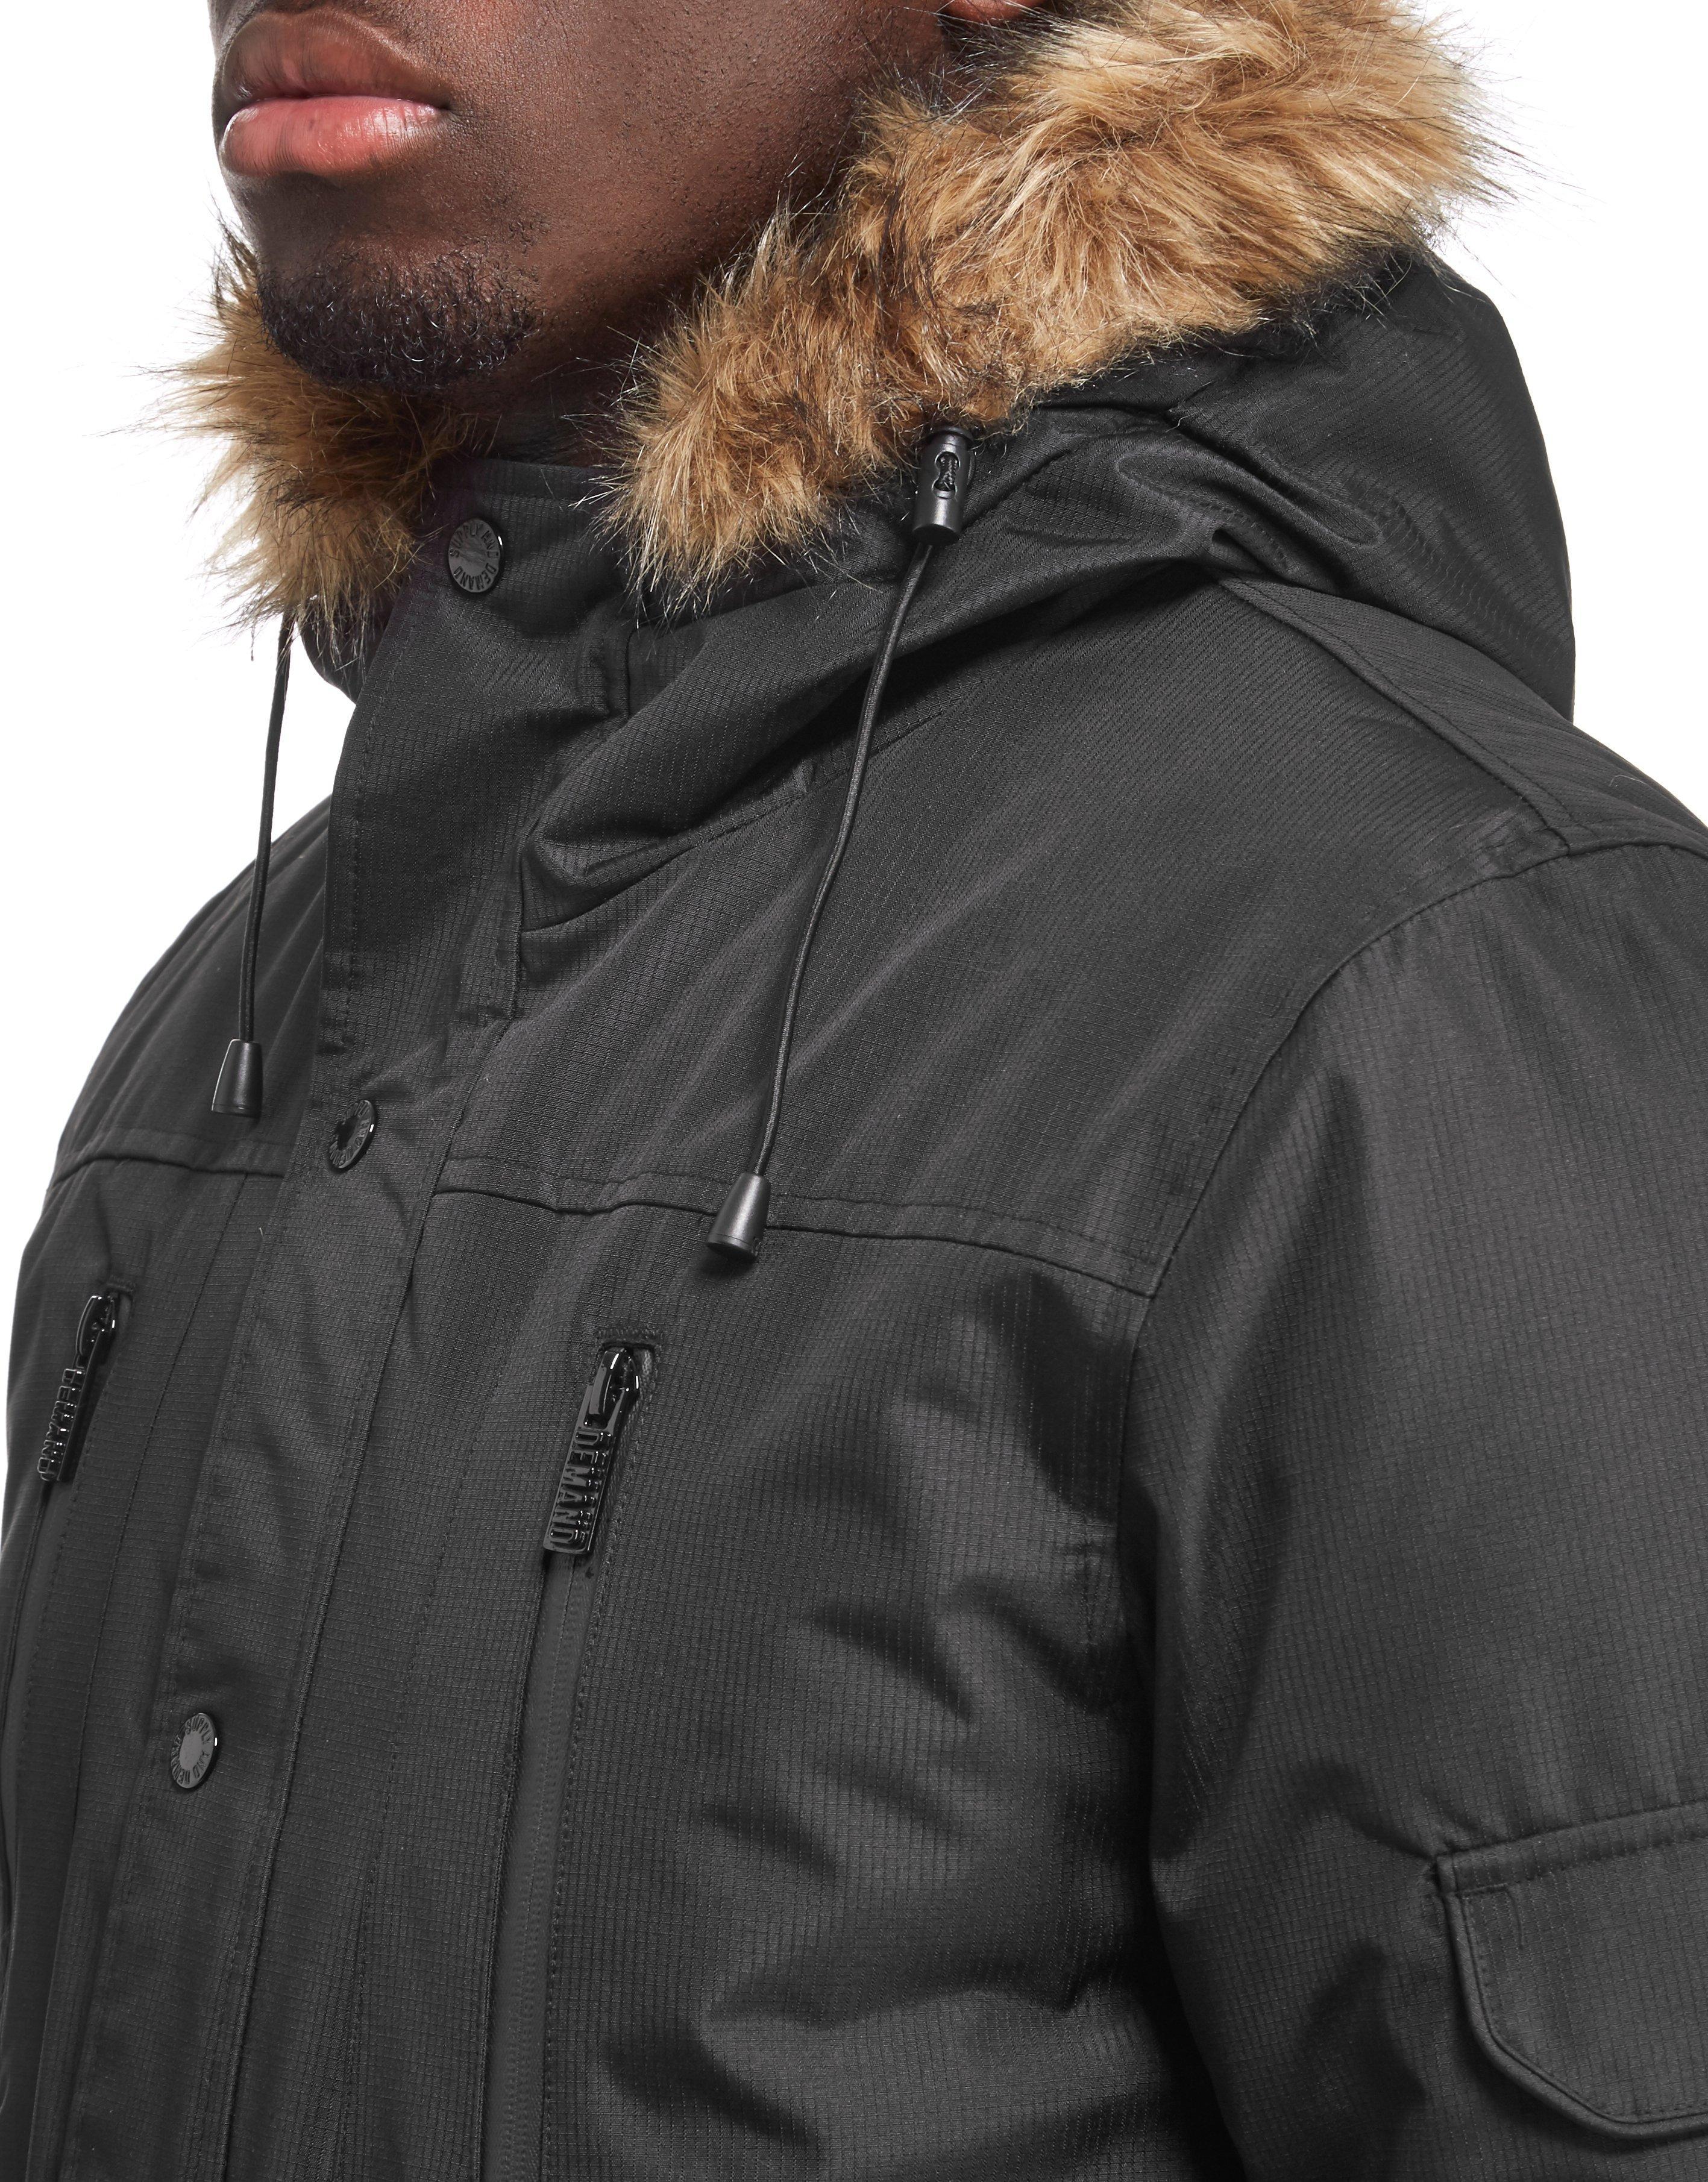 Supply and demand black parka jacket